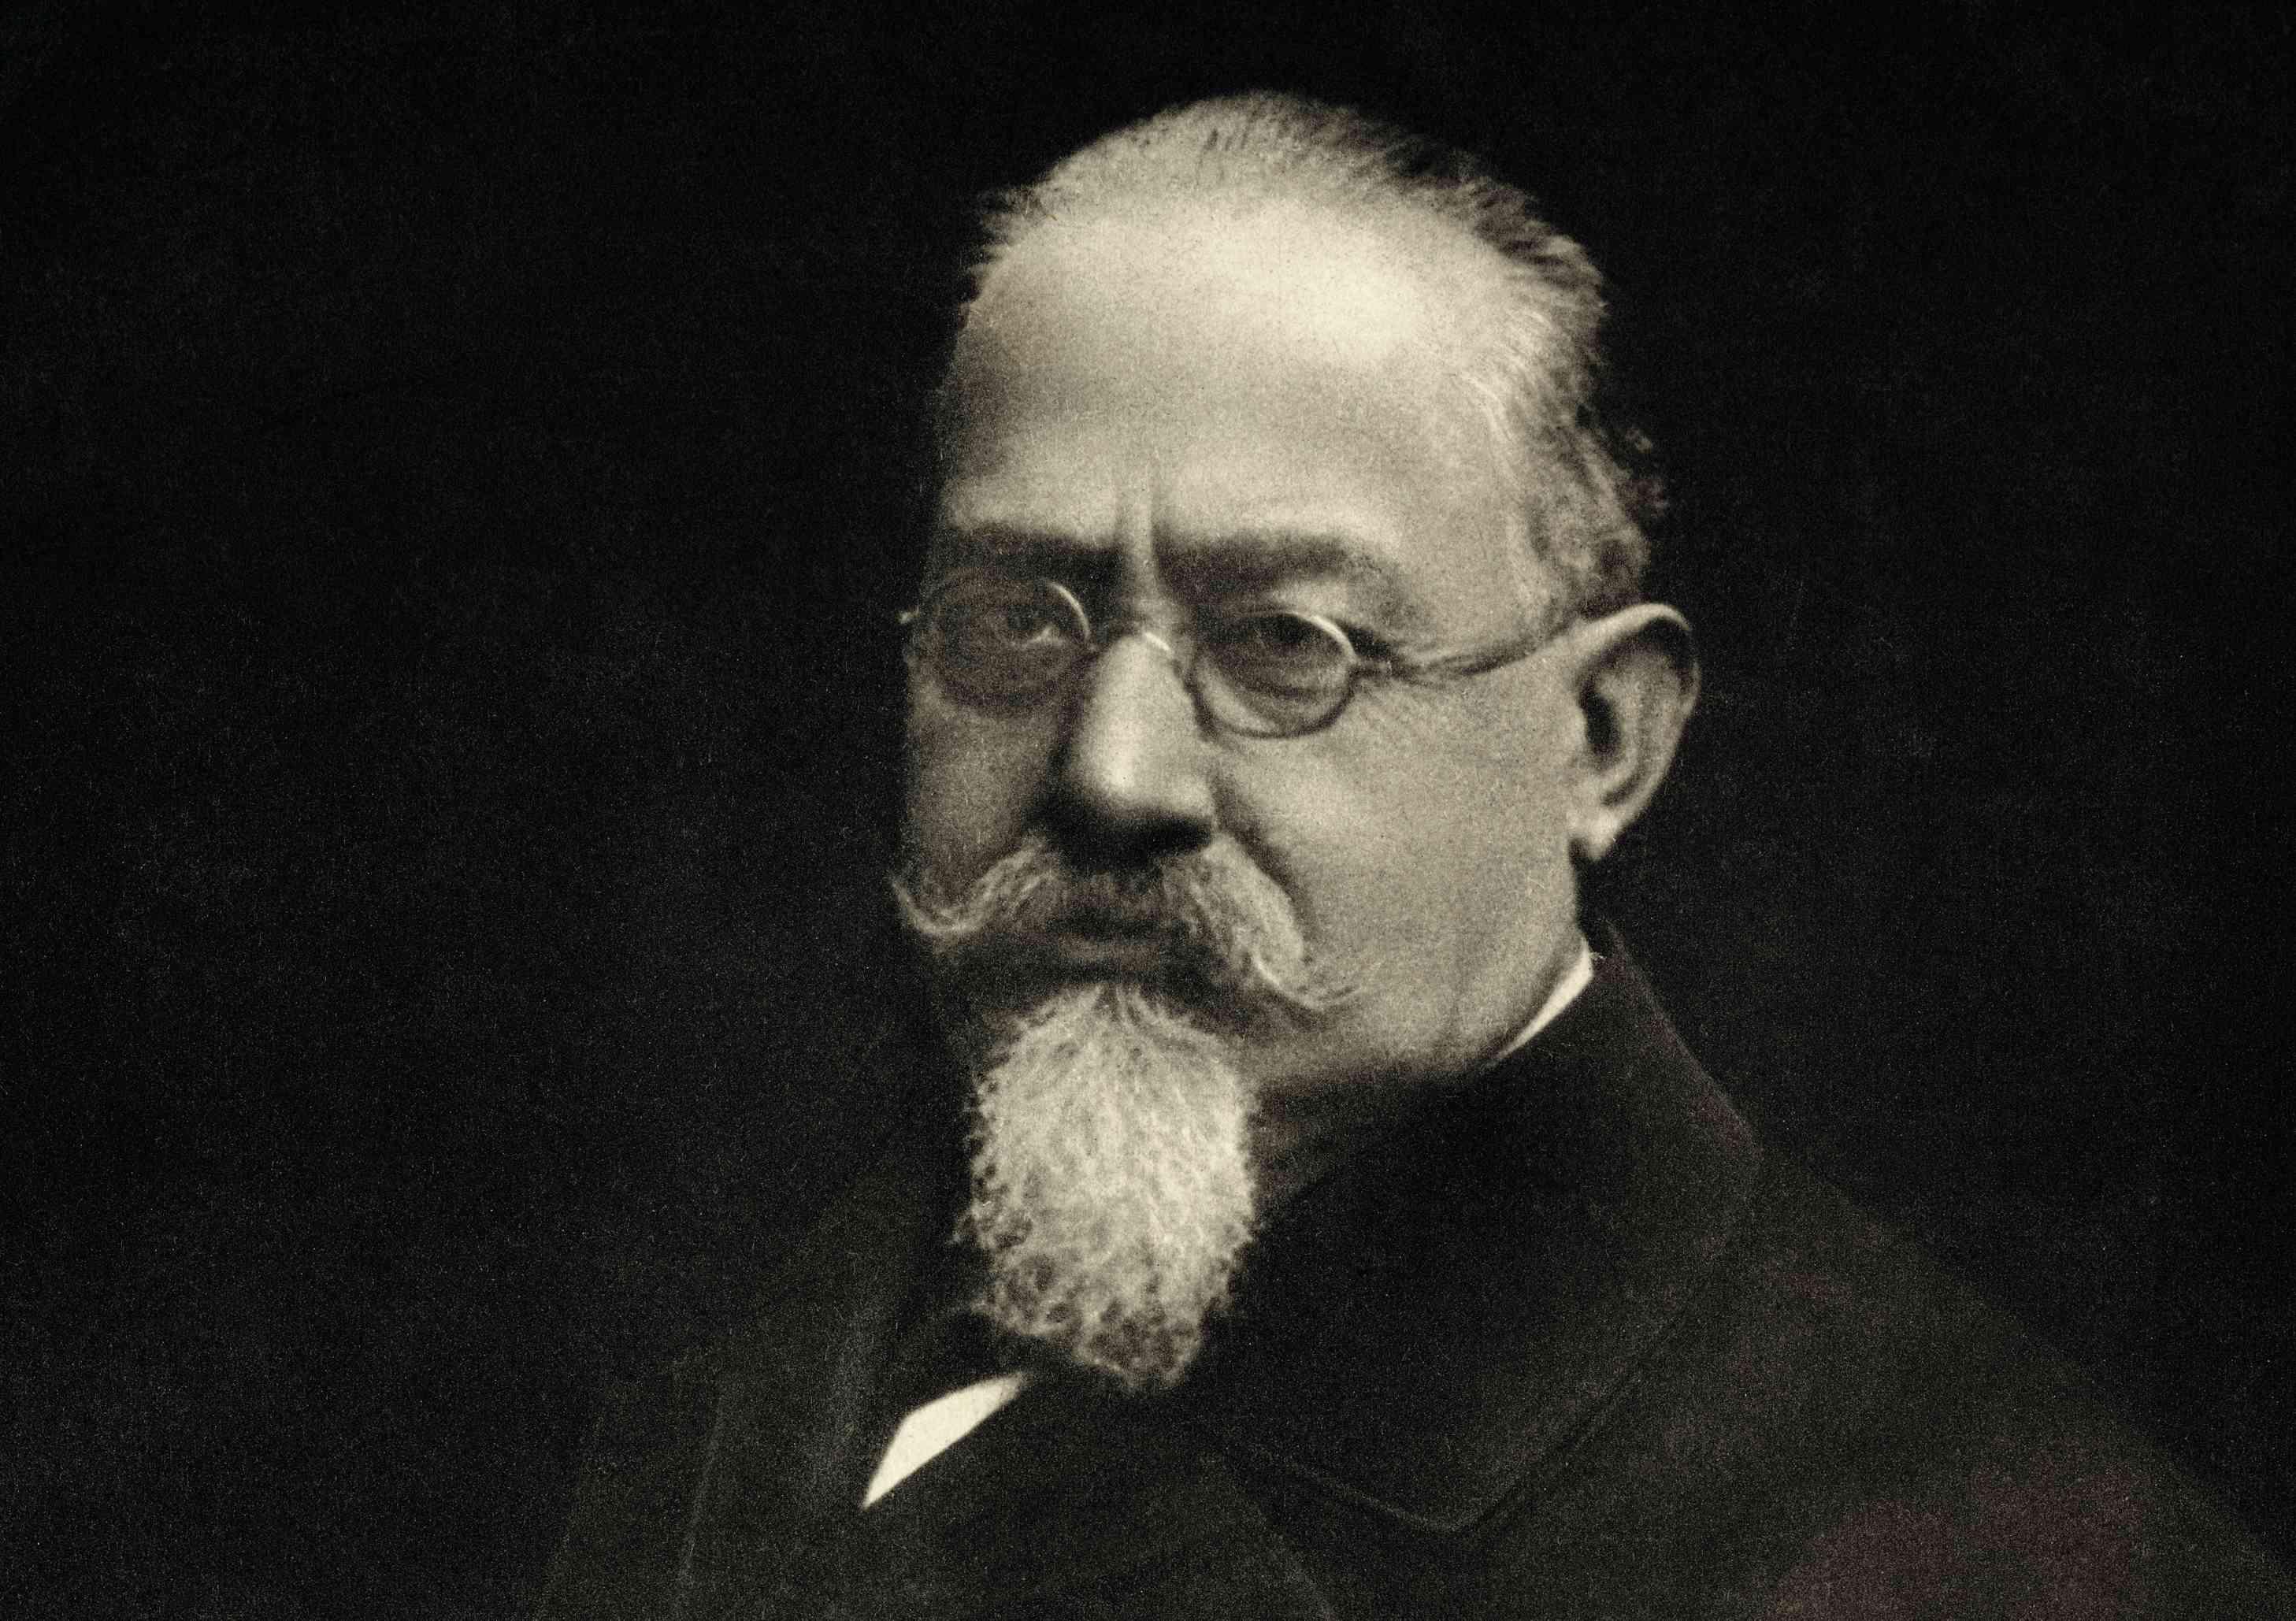 Portrait of Cesare Lombroso